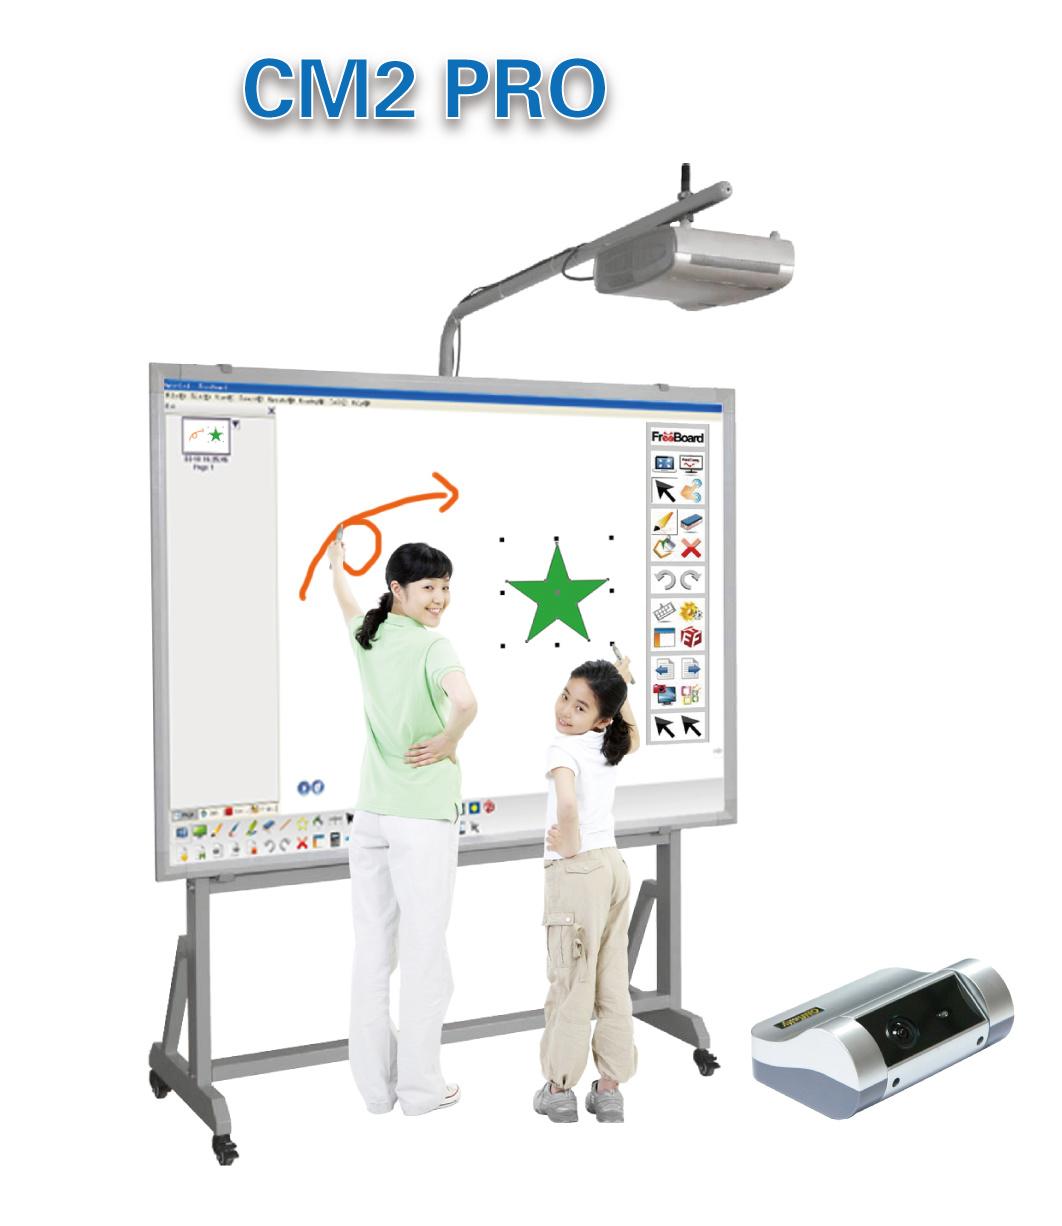 Cm2 PRO - Multi Touch Portable Interactive Whiteboard